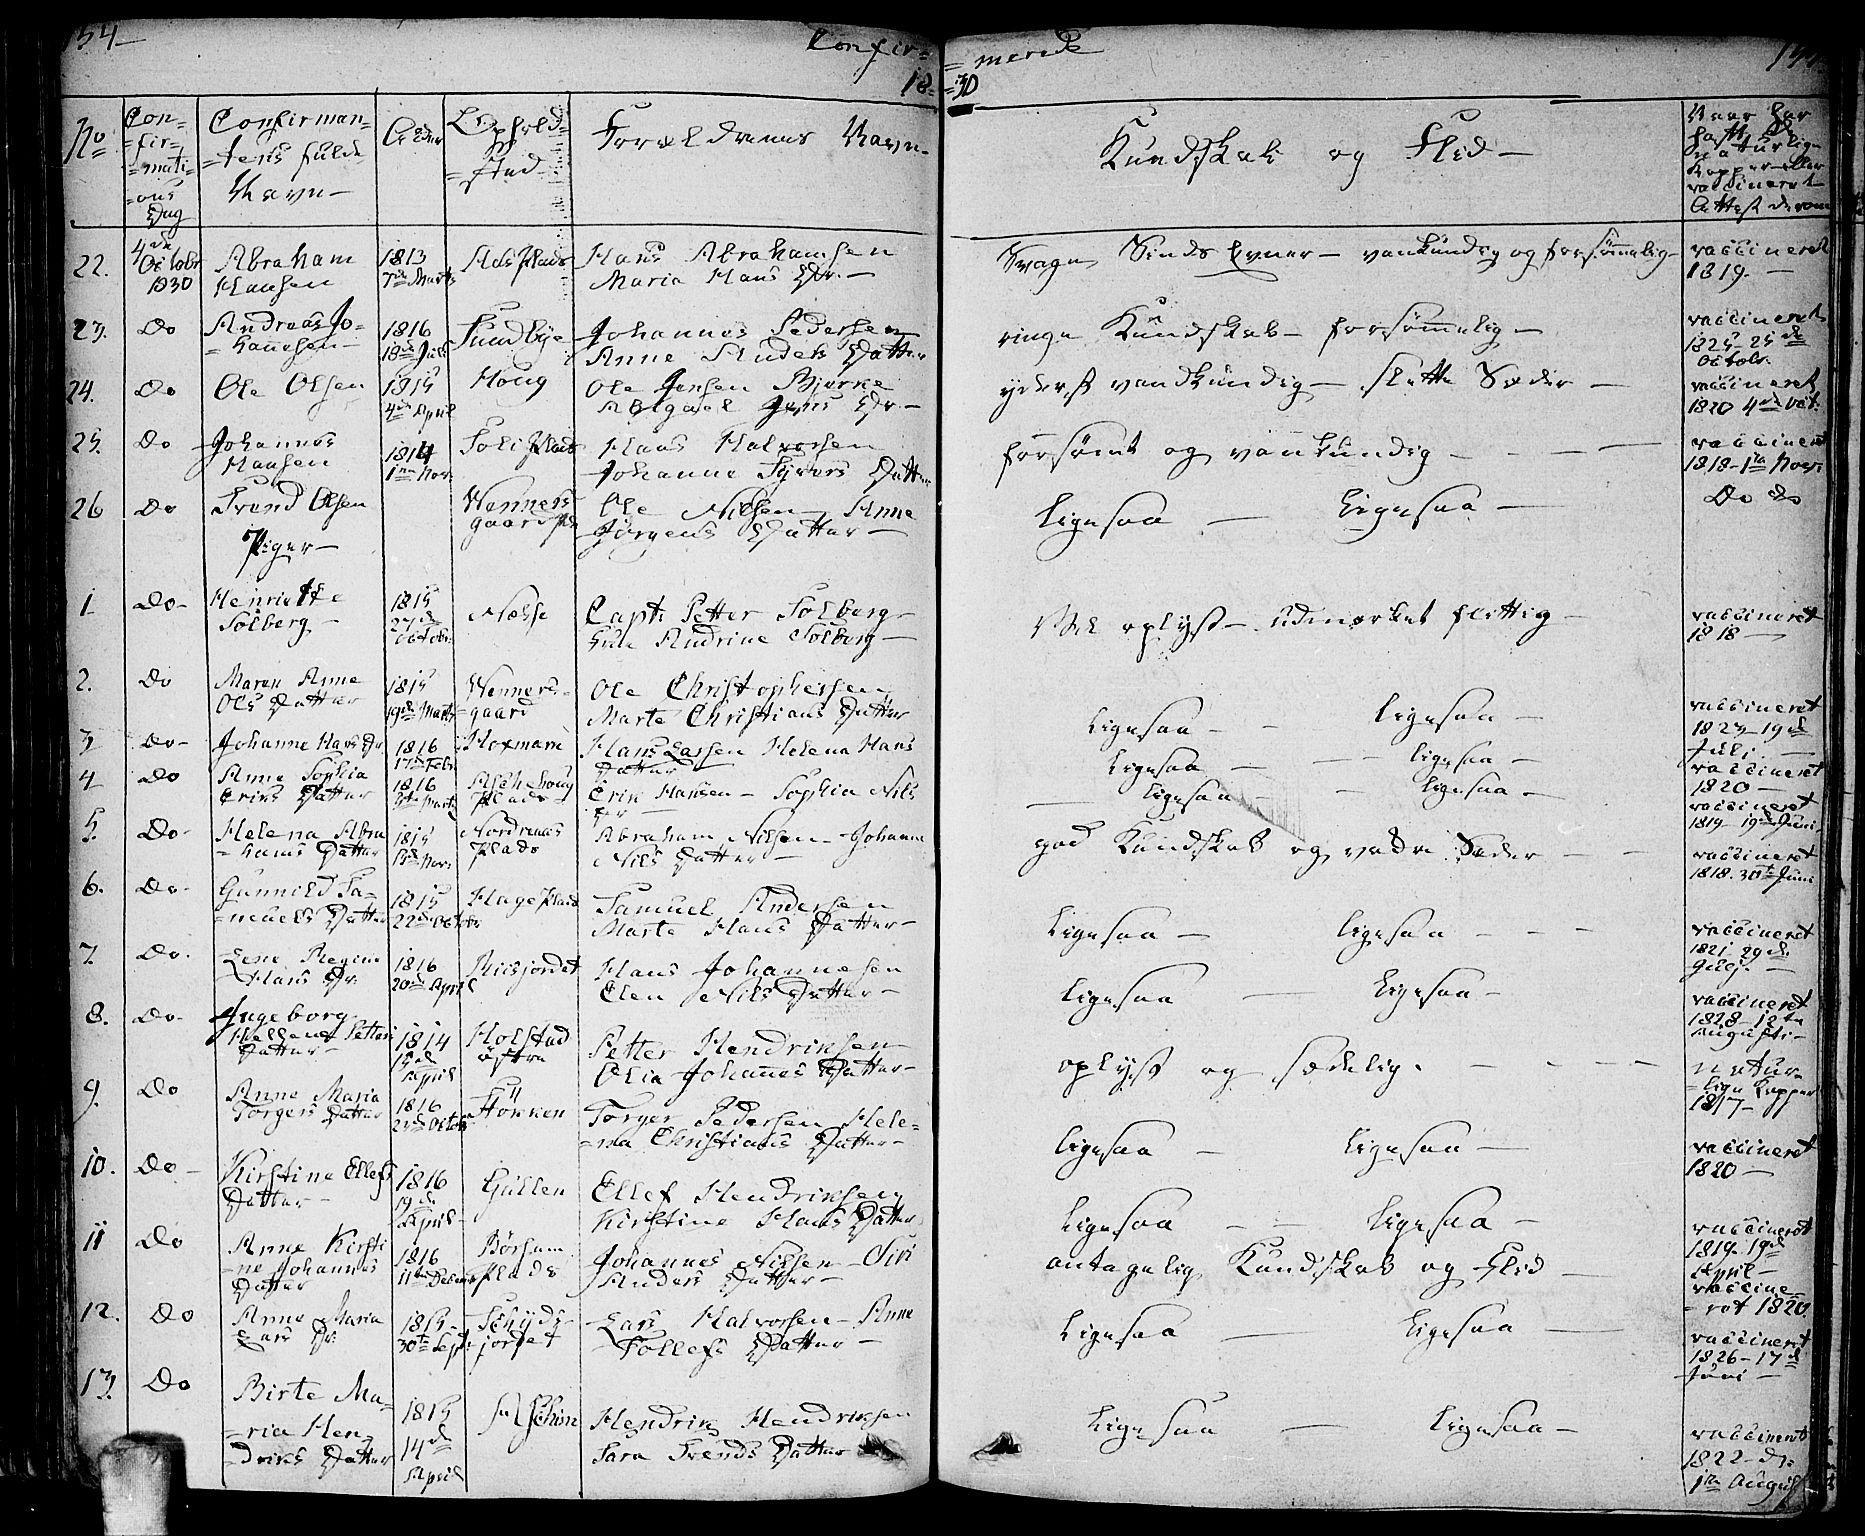 SAO, Ås prestekontor Kirkebøker, F/Fa/L0005: Ministerialbok nr. I 5, 1827-1840, s. 154-155